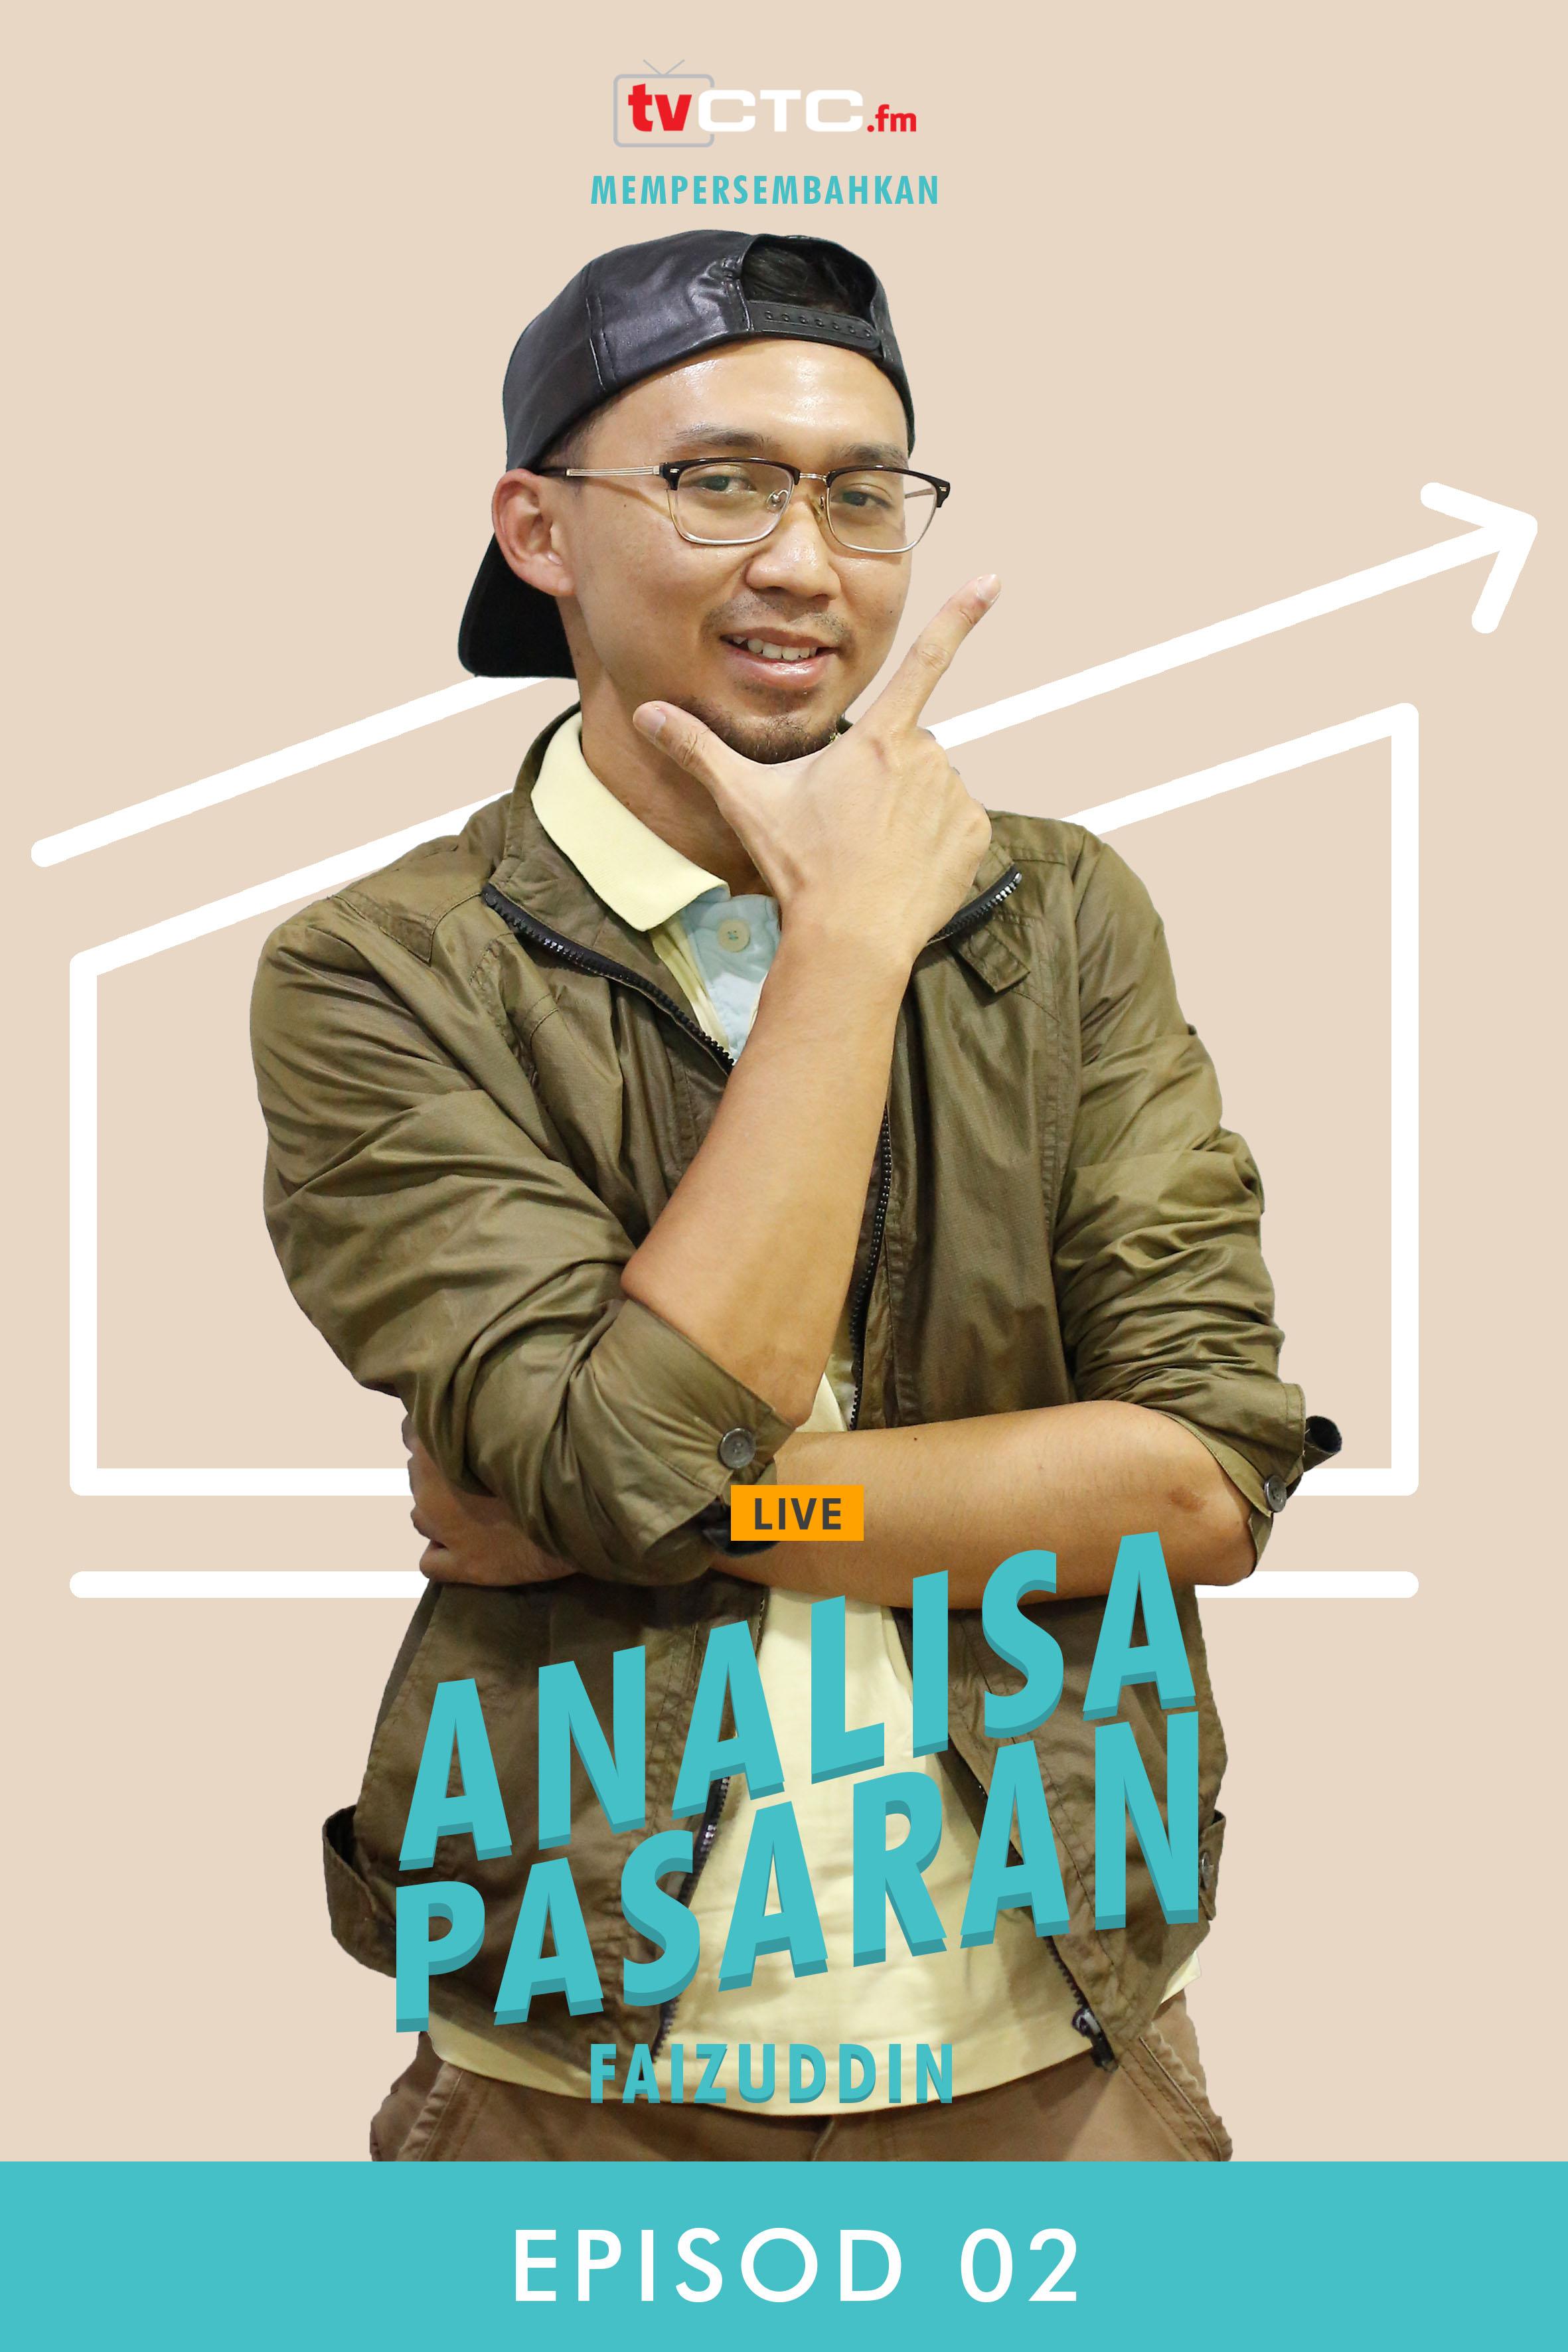 ANALISA PASARAN : Faizuddin (Episod 2)